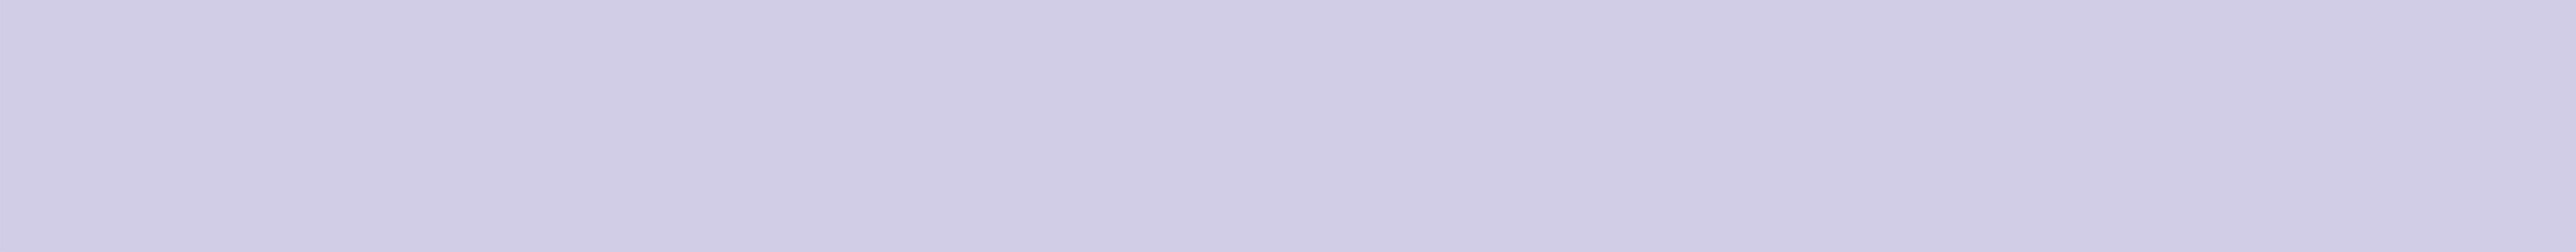 franja gris claro.png